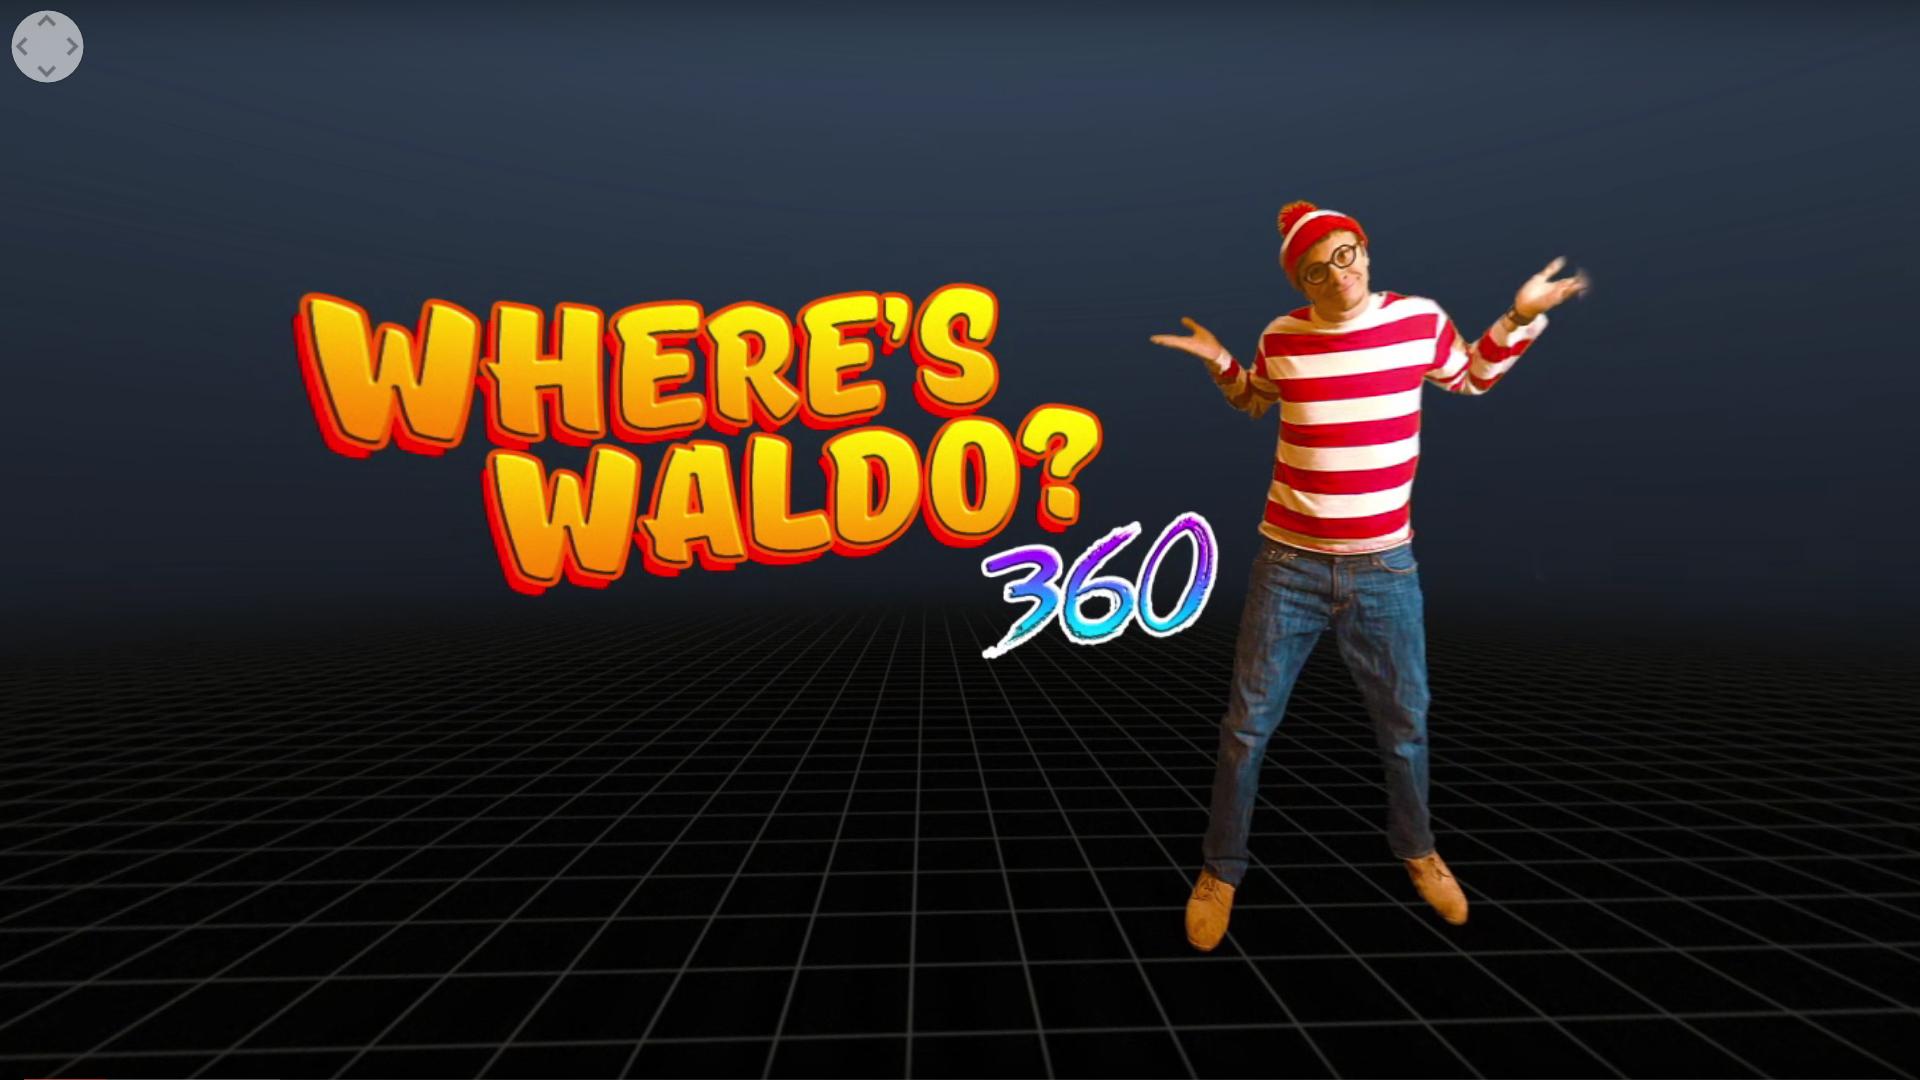 Where's Waldo 360 Mettle SkyBox Studio